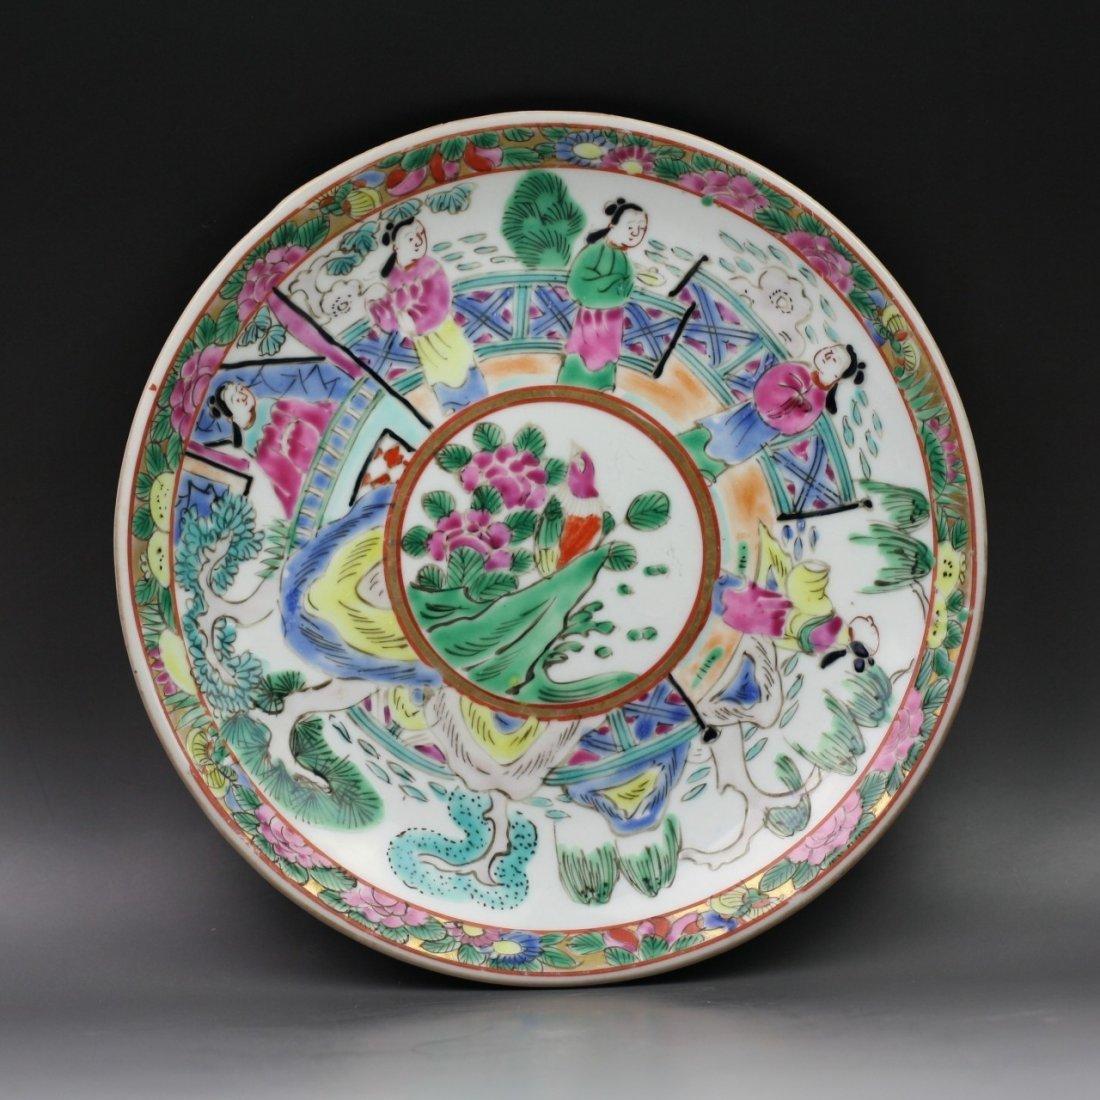 133: A Japanese Imari Polychrome Porcelain Plate